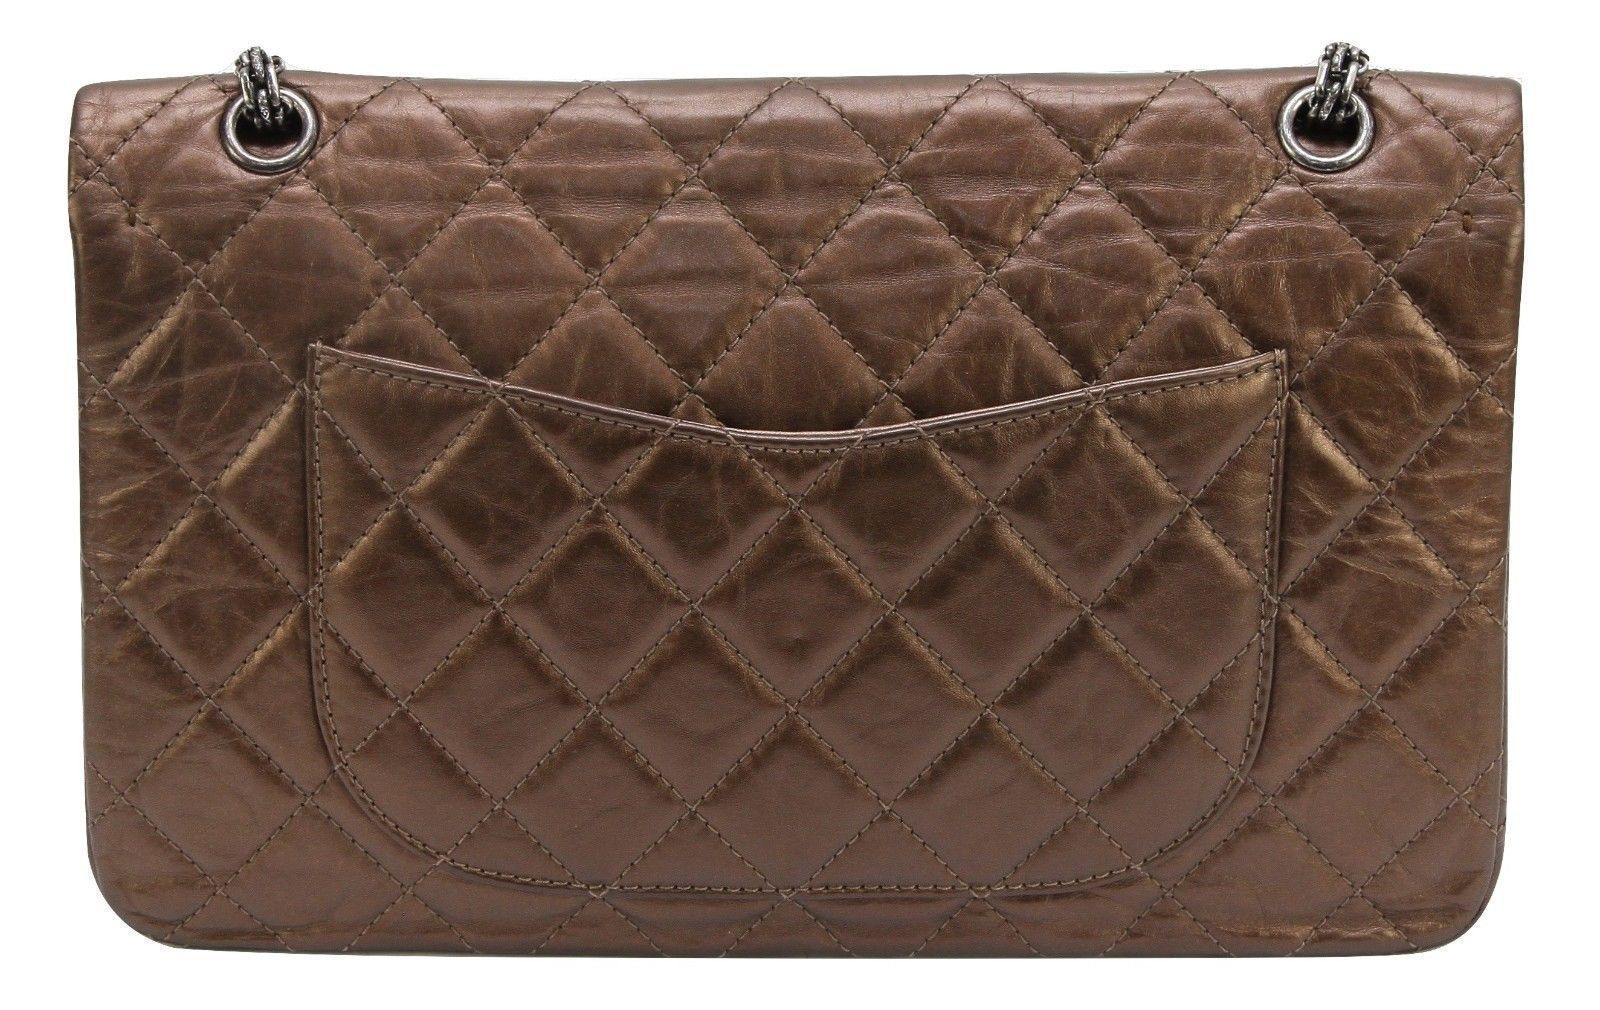 ff7acac590c837 CHANEL Bag Metallic Leather 2.55 Reissue 227 Bronze Flap Shoulder Ruthenium  HW